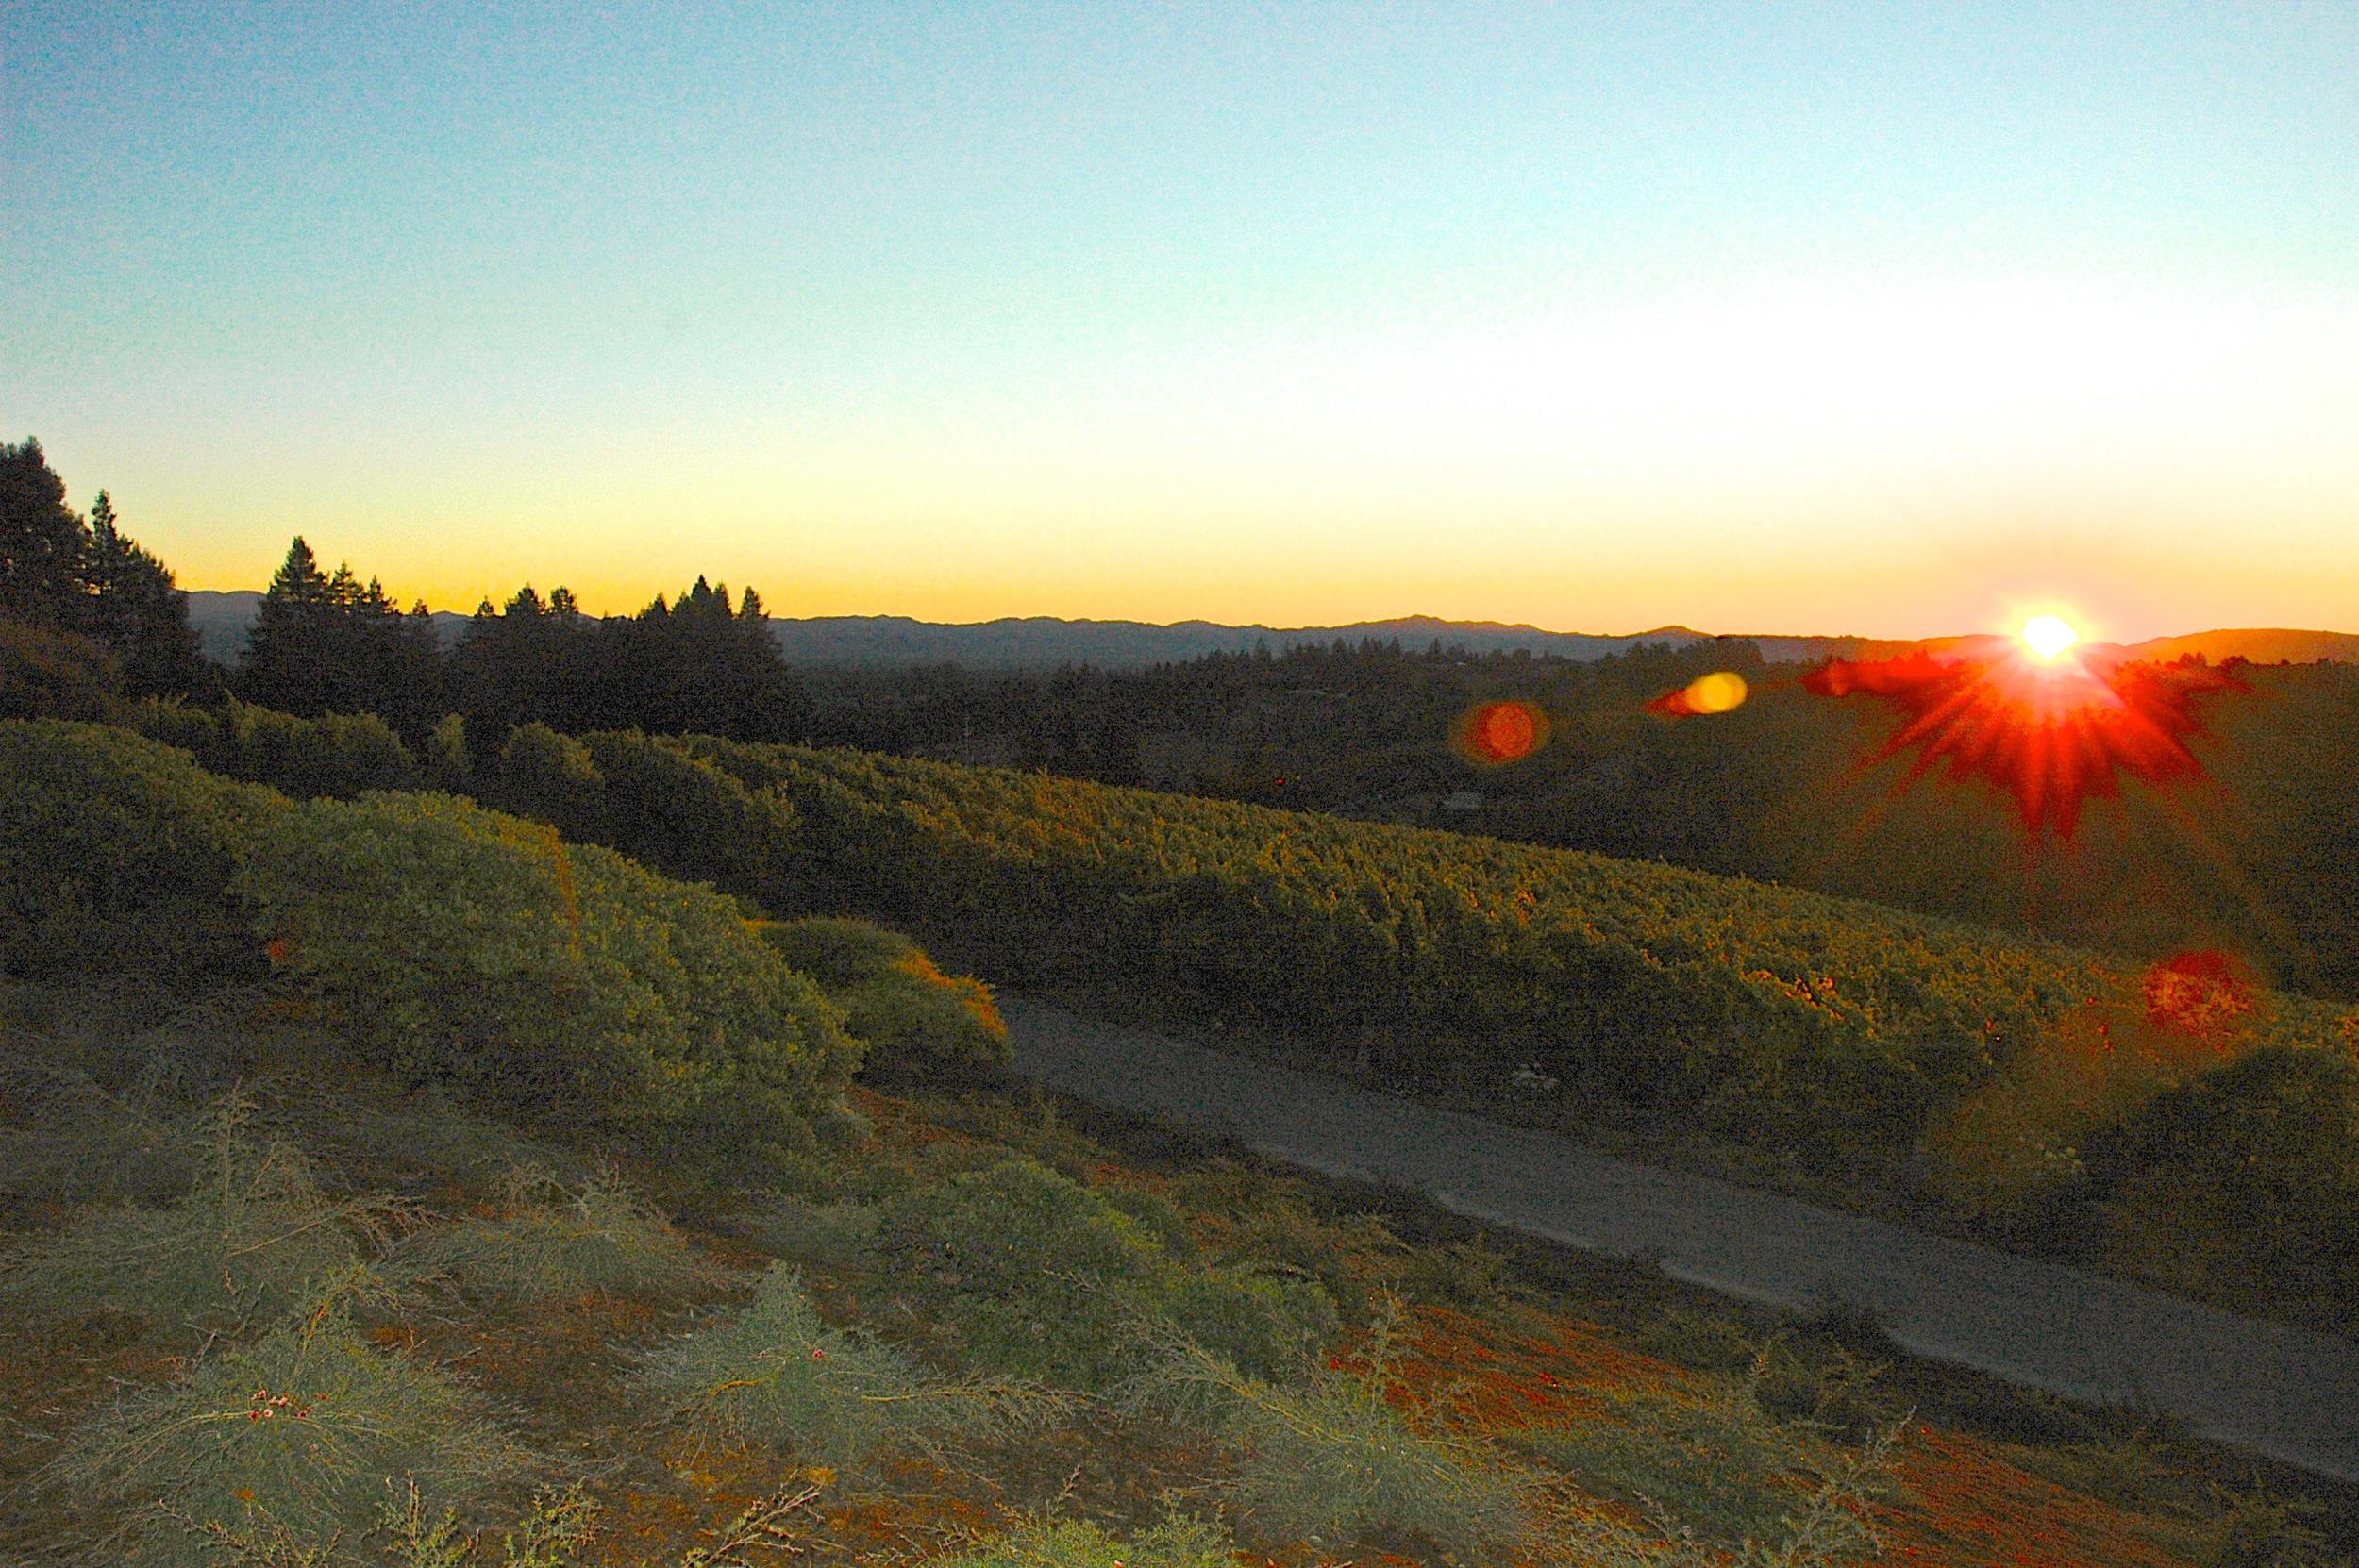 Sunrise at Hawk Hill Vineyard